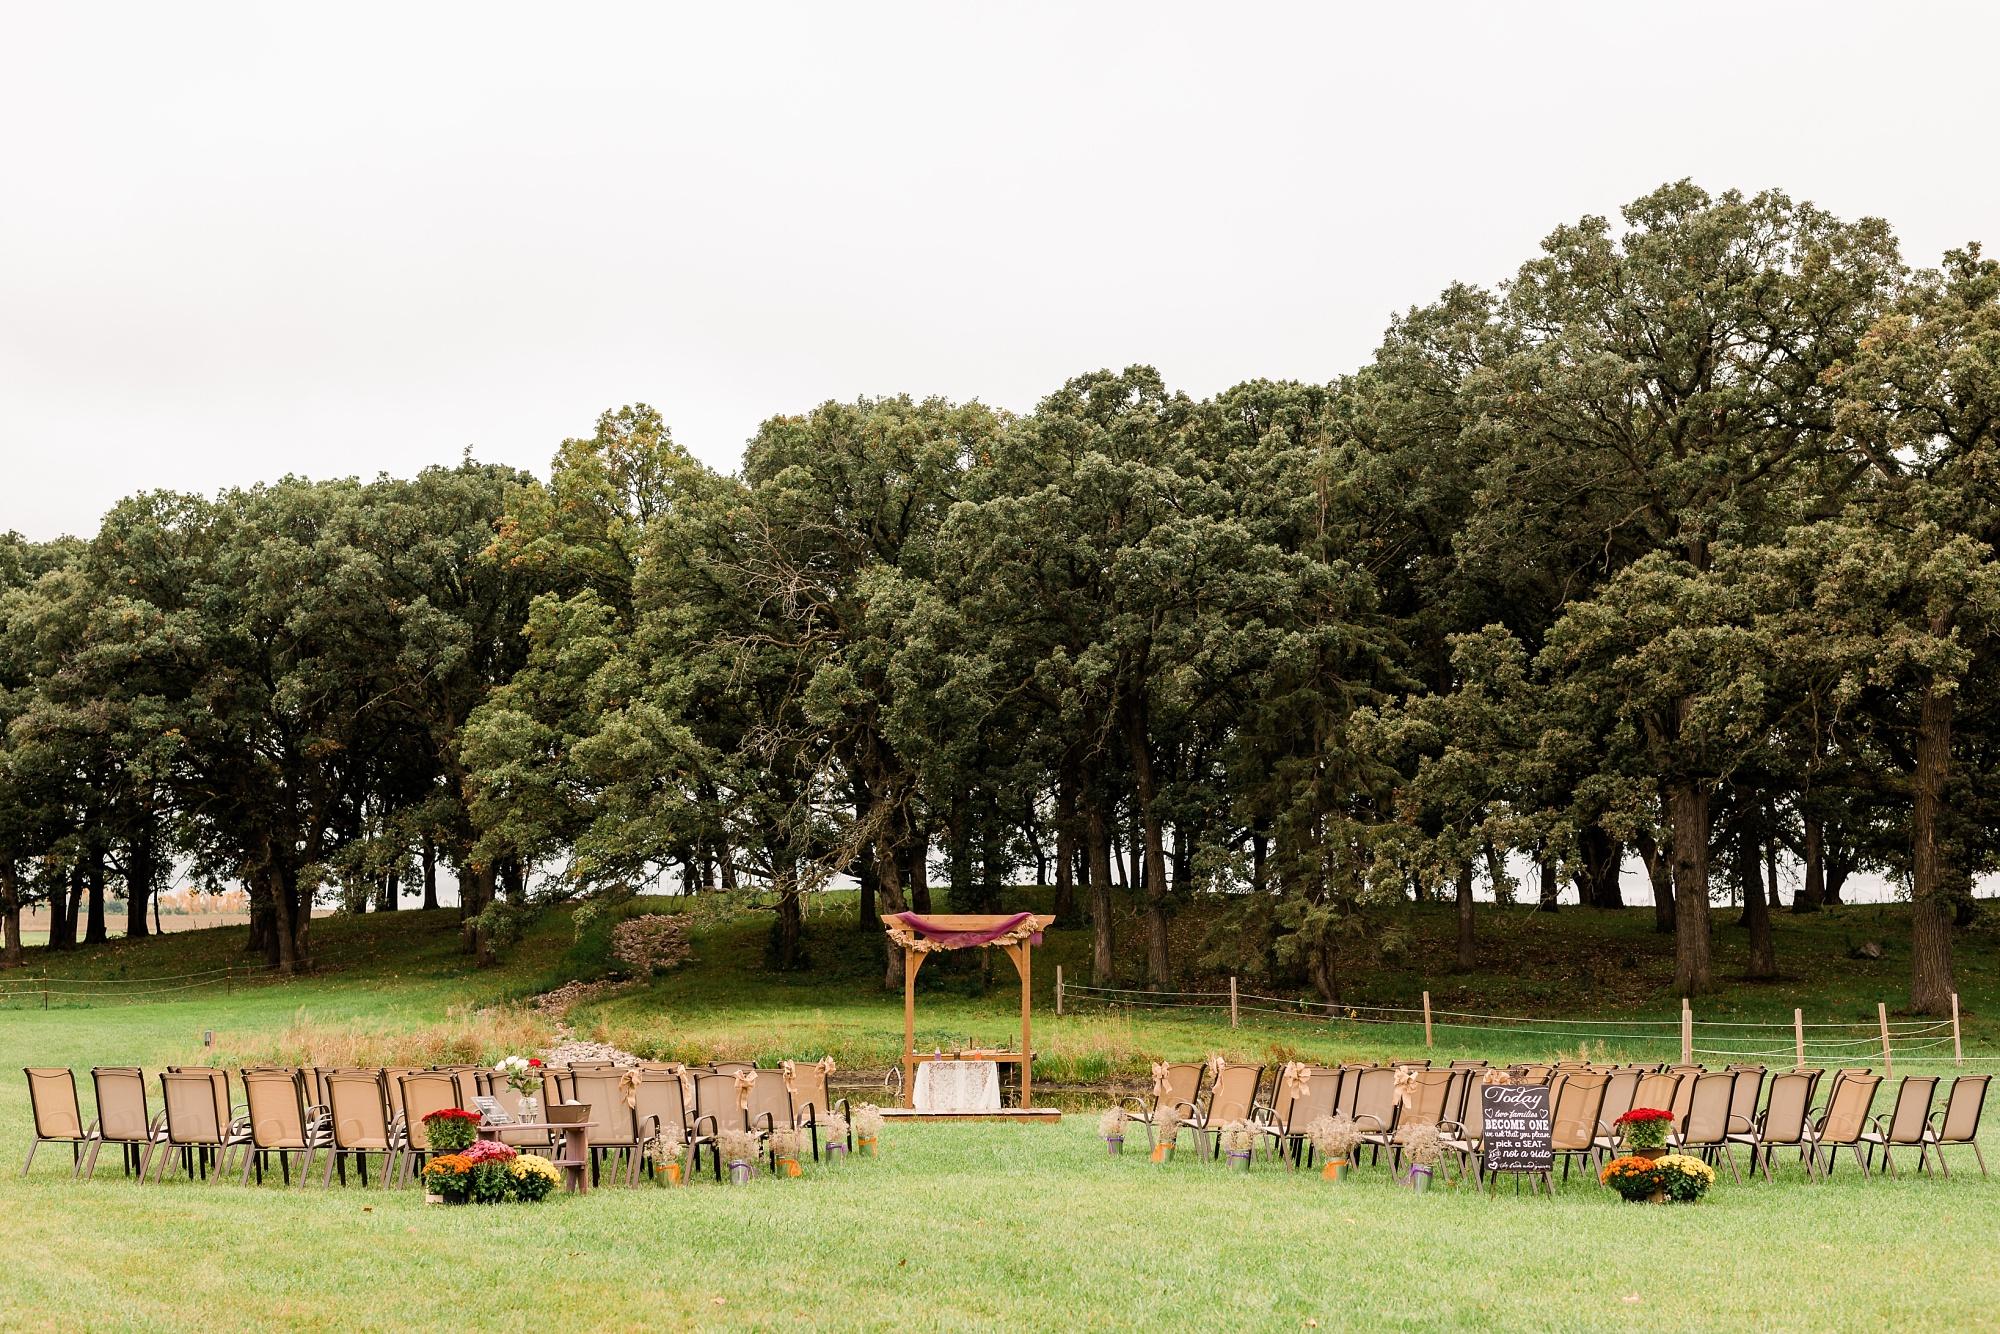 Amber Langerud_Lake Park MN Barn wedding at the Hitching Post_0438.jpg